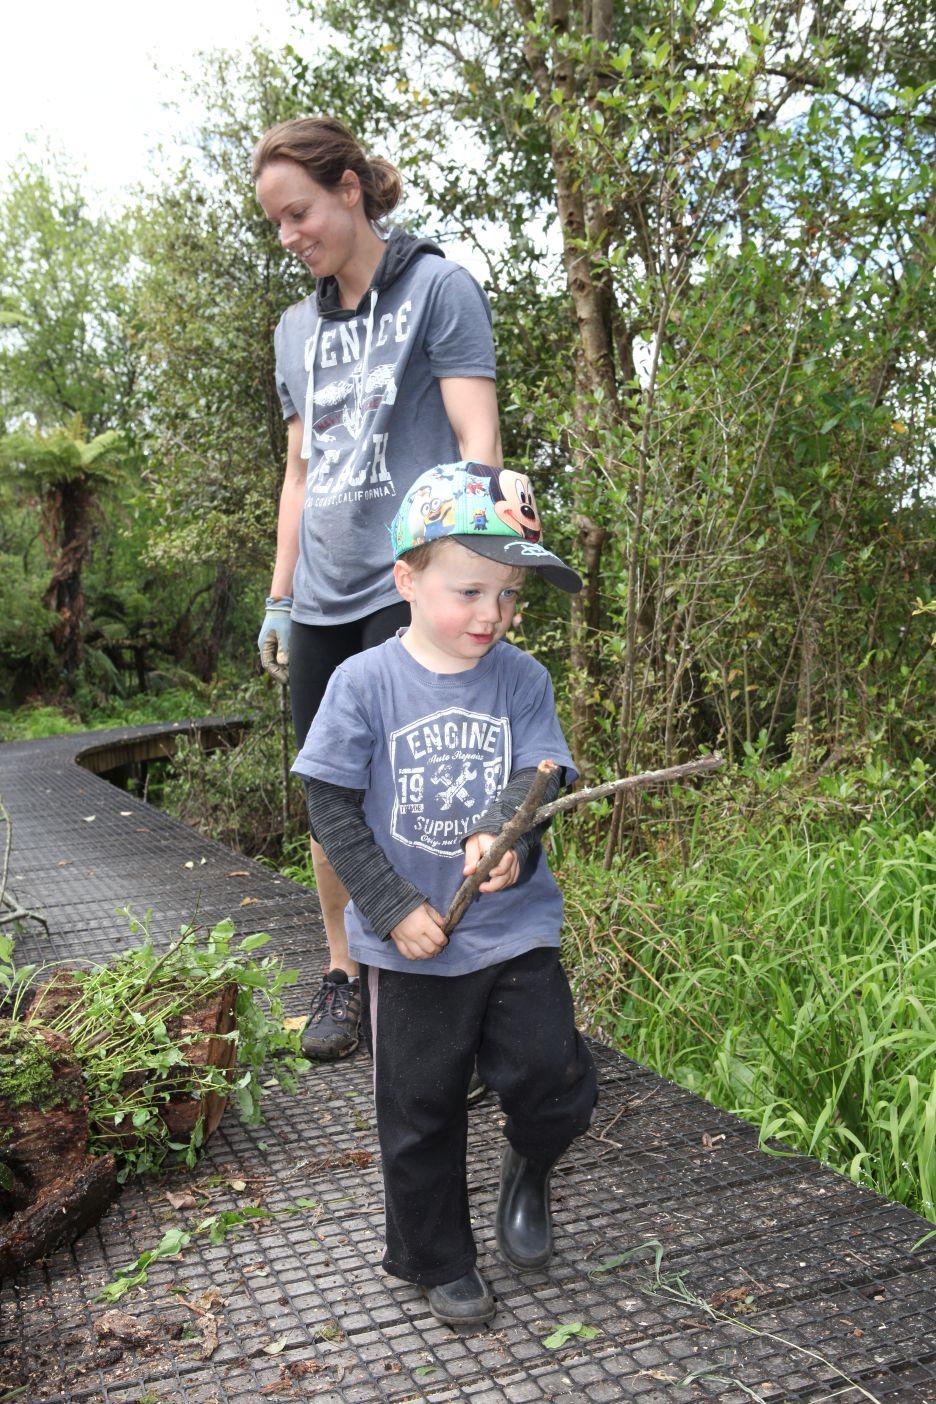 Act-of-Kindness-Volunteer-Waikato-River-Trails-IMG_0598.JPG